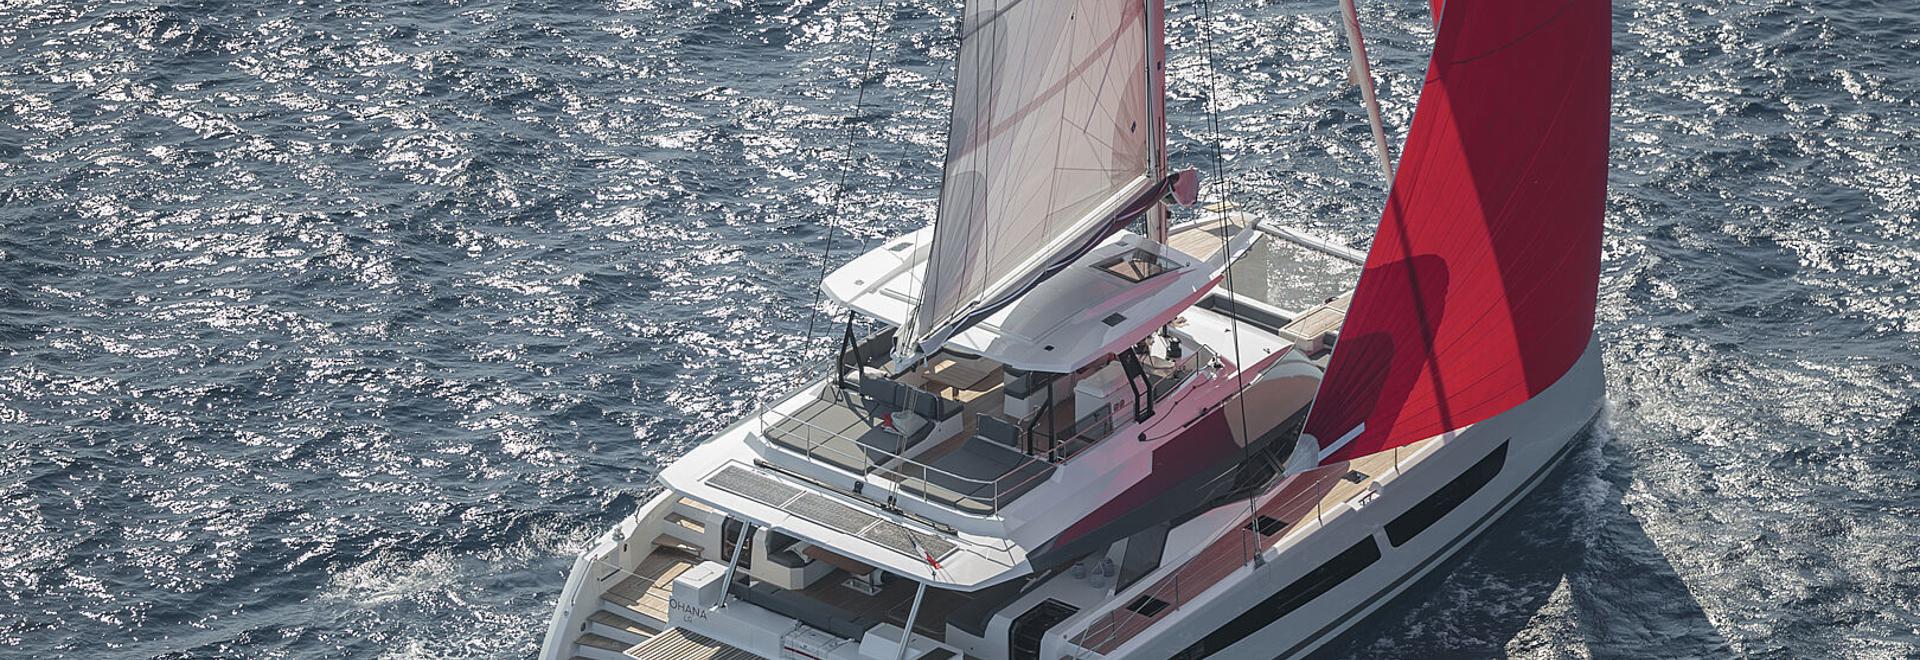 Fountaine Pajot costruirà yacht a idrogeno